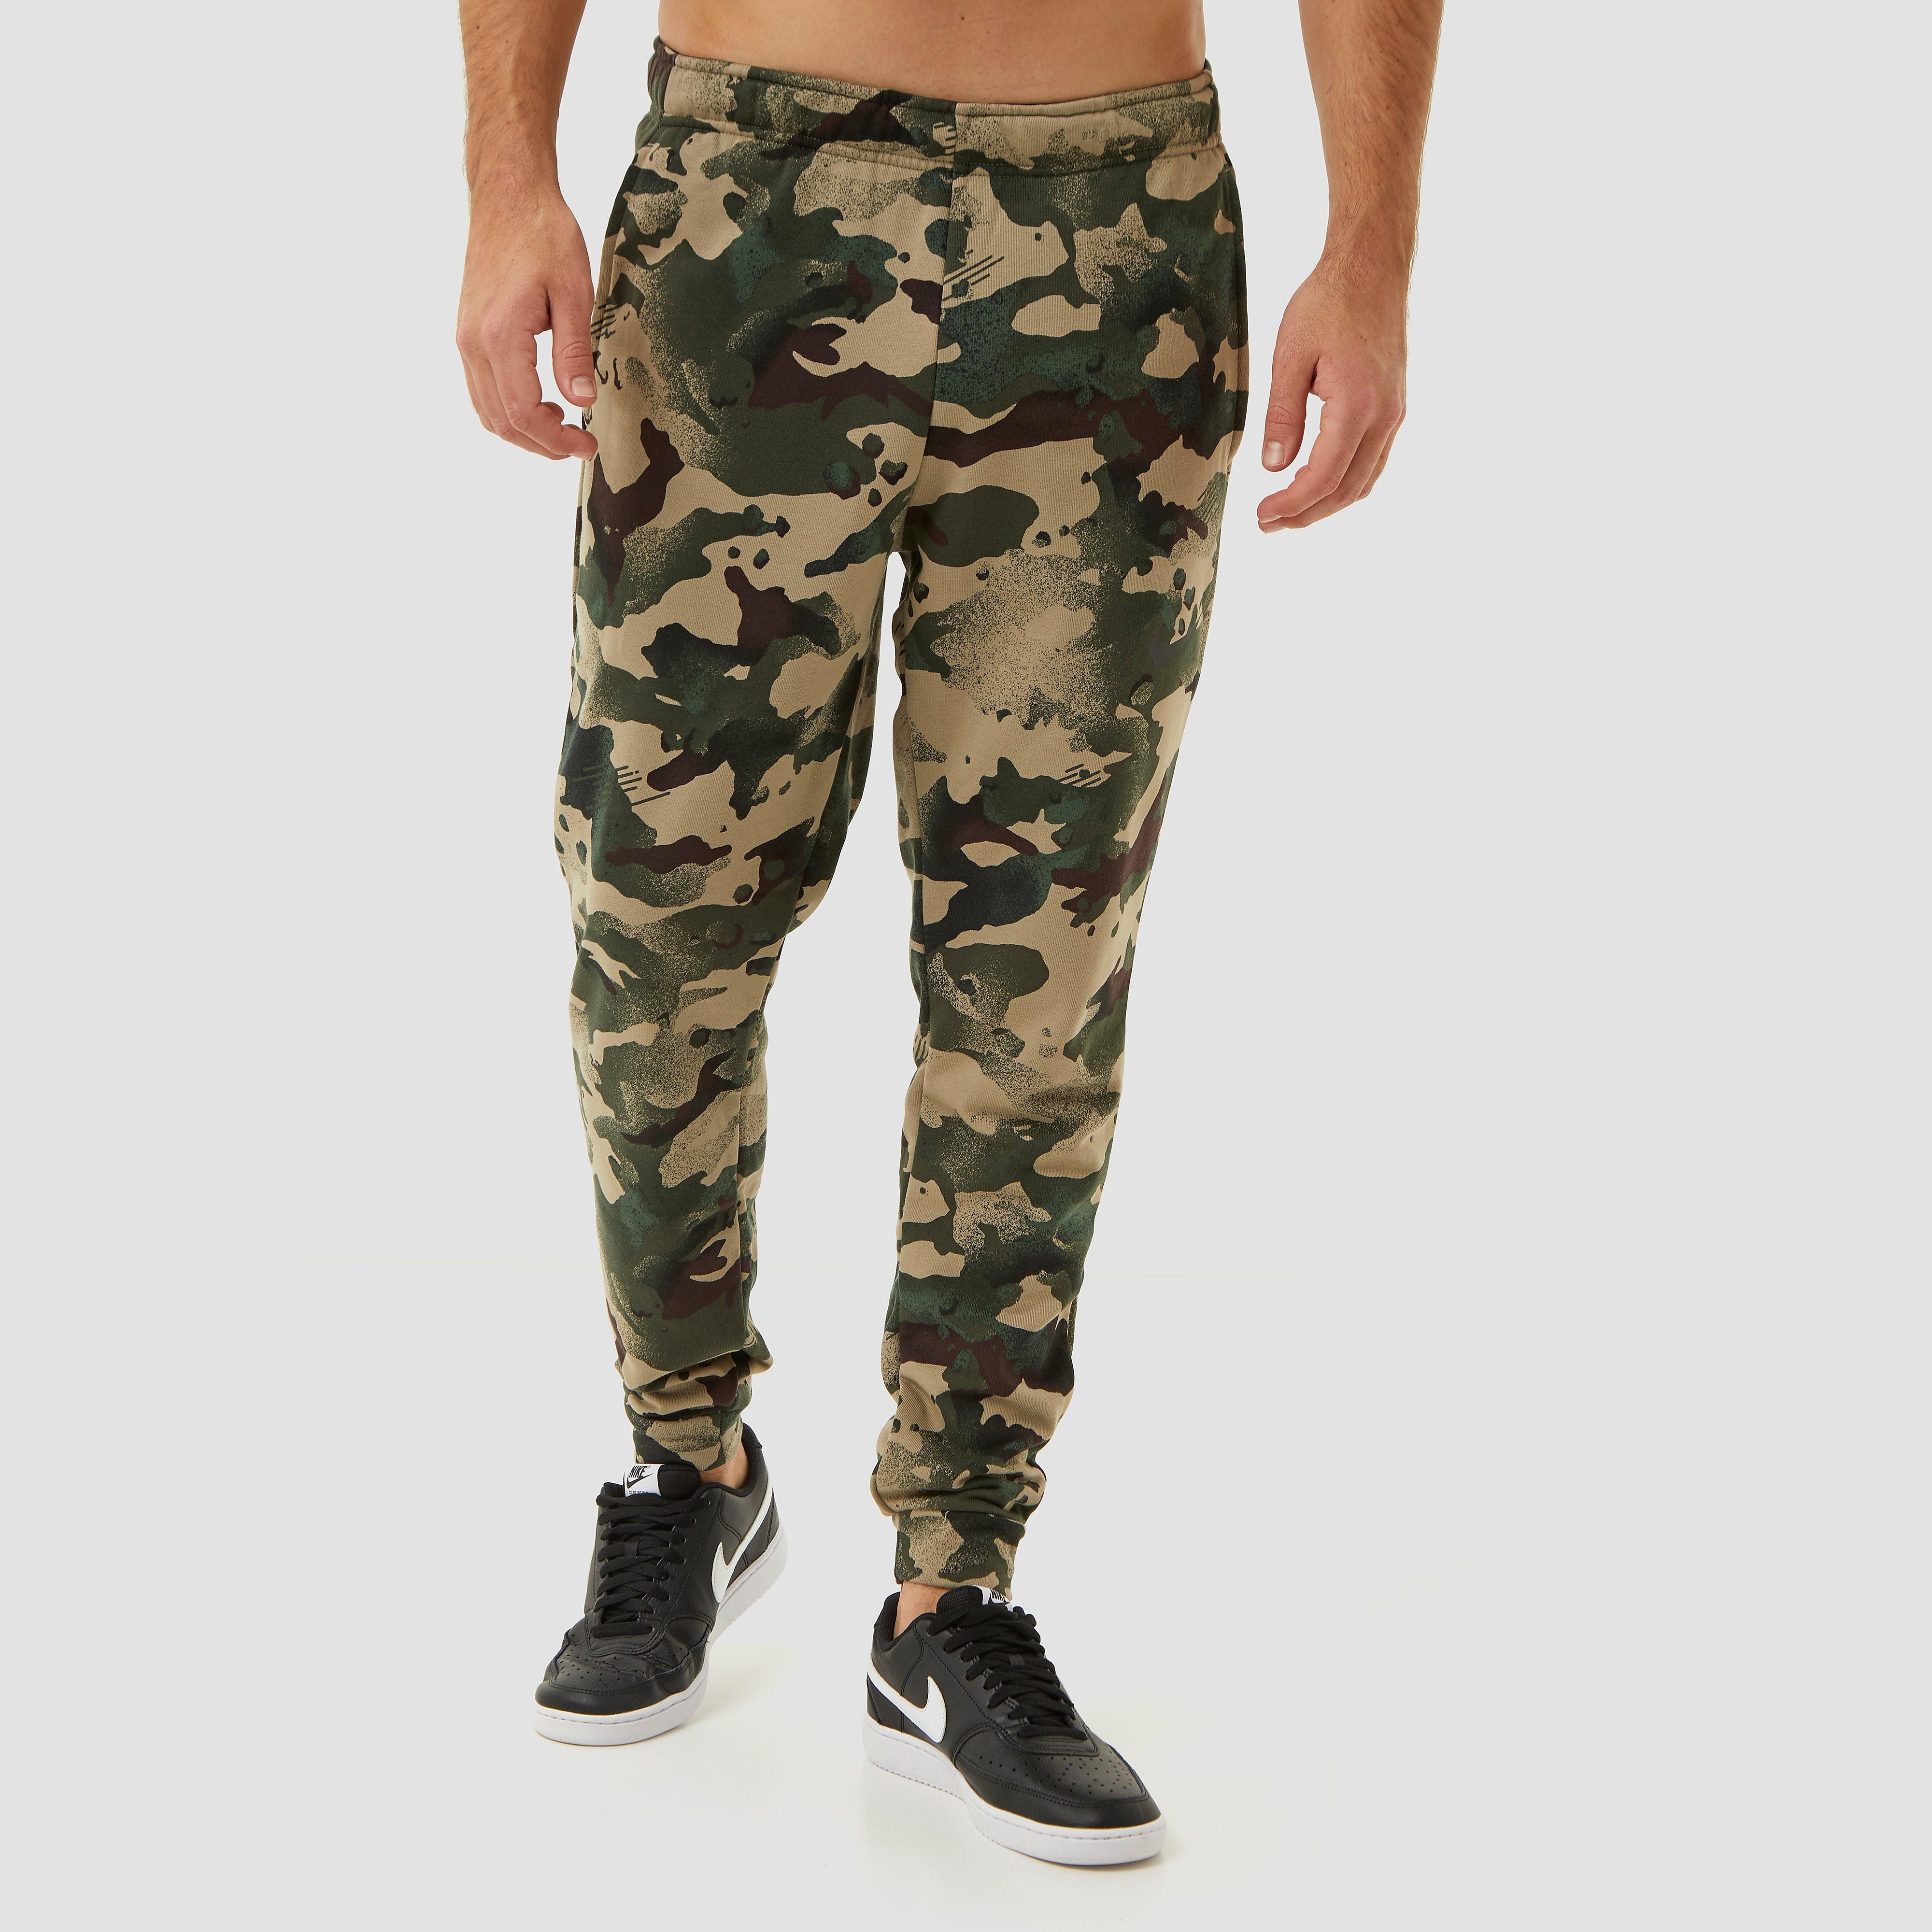 NIKE Dri-fit camouflage trainingsbroek groen heren Heren